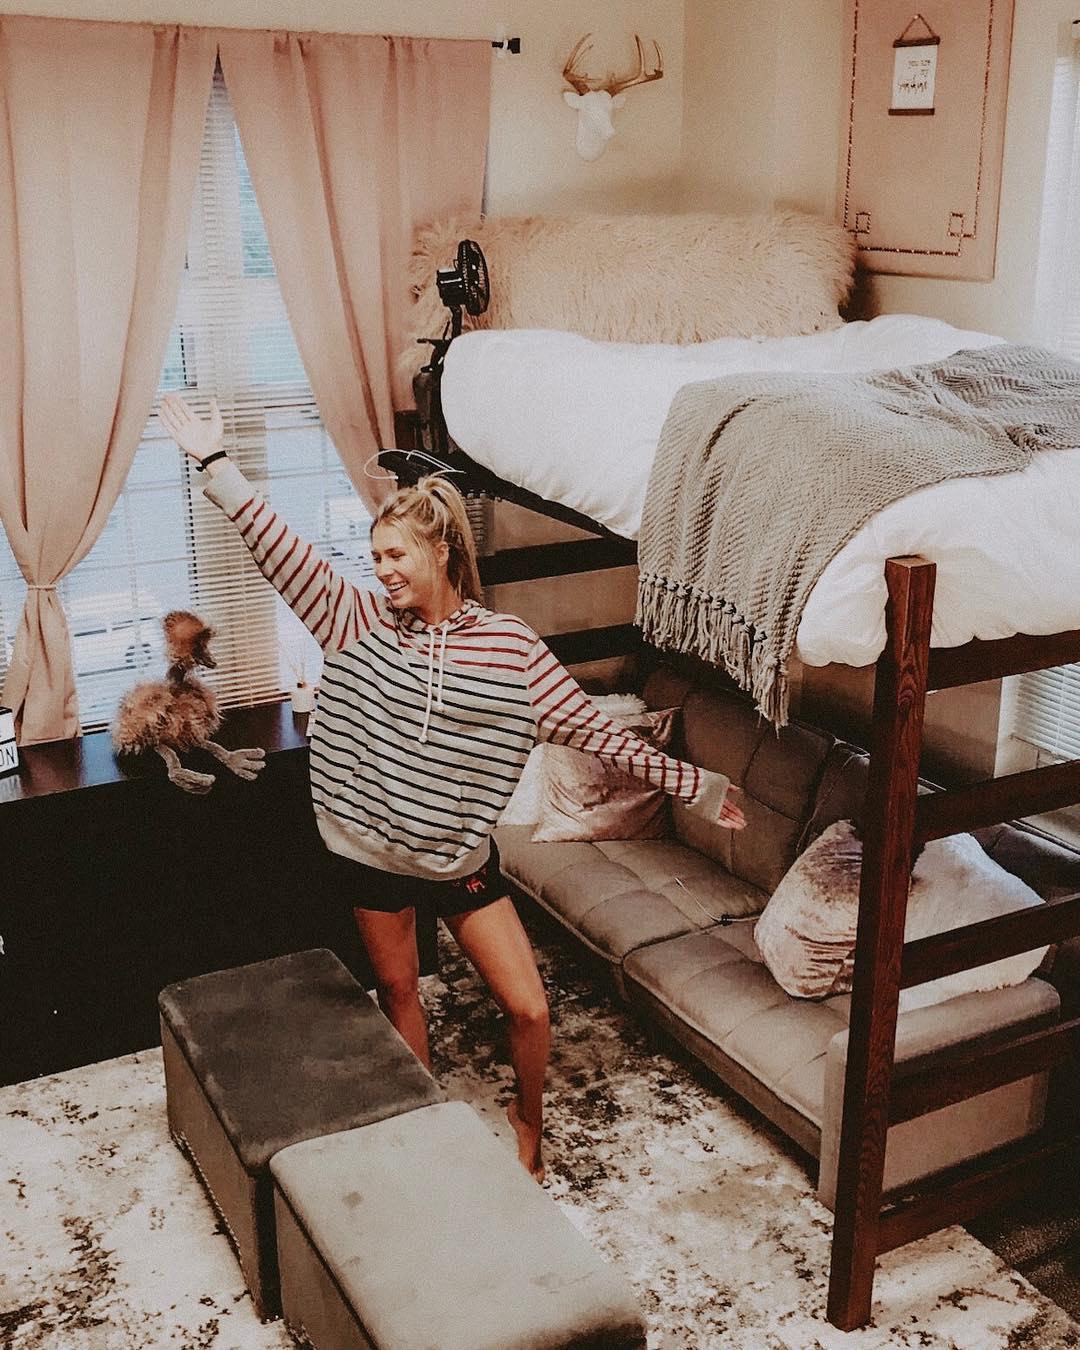 14 Seriously Impressive Girl Dorm Room Layout Ideas